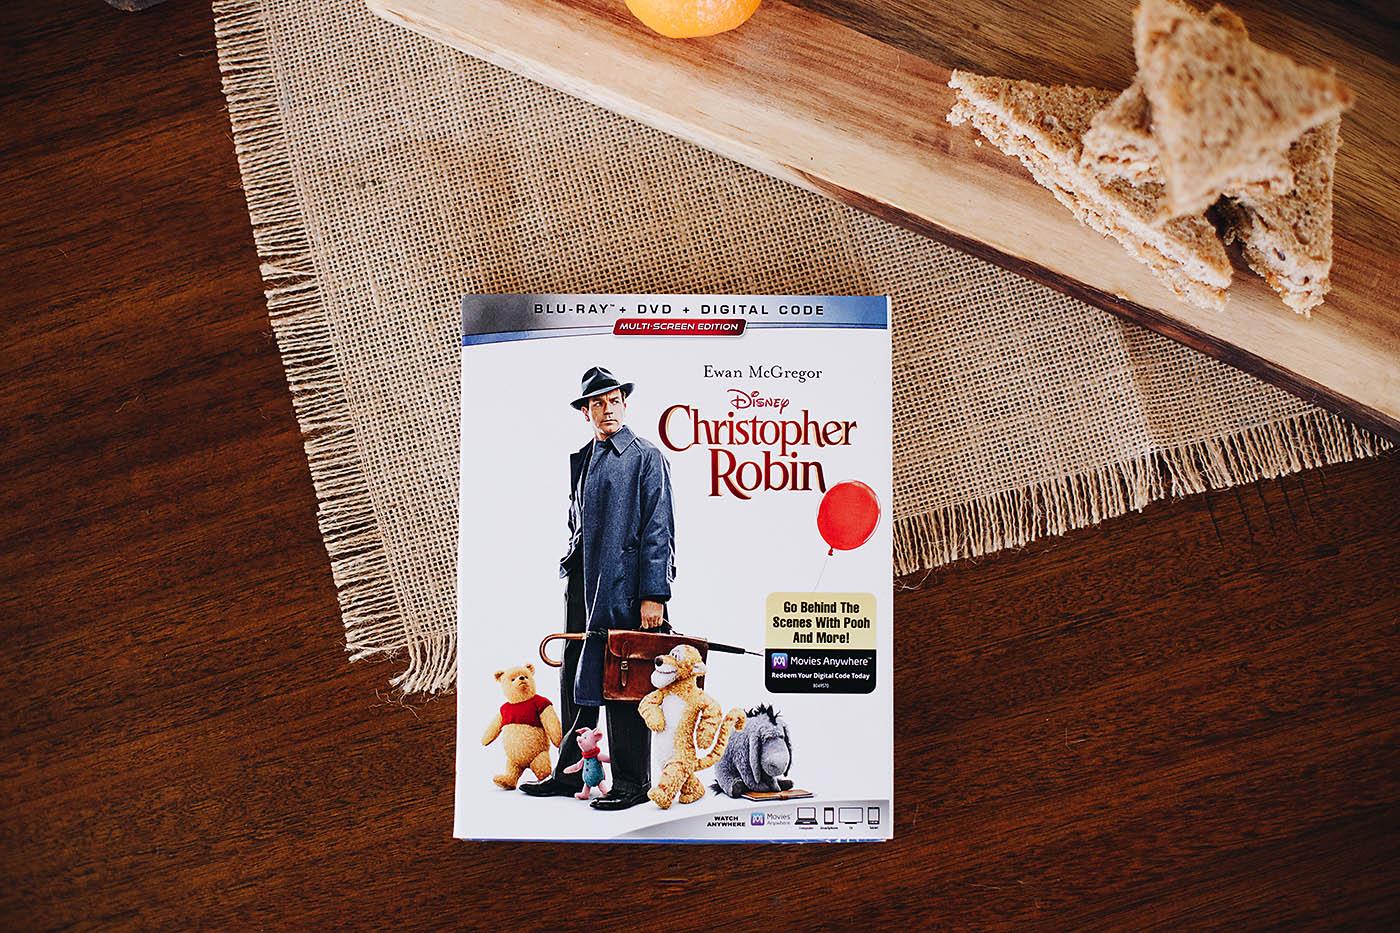 Christopher Robin Themed Friendsgiving Movie Night Ideas